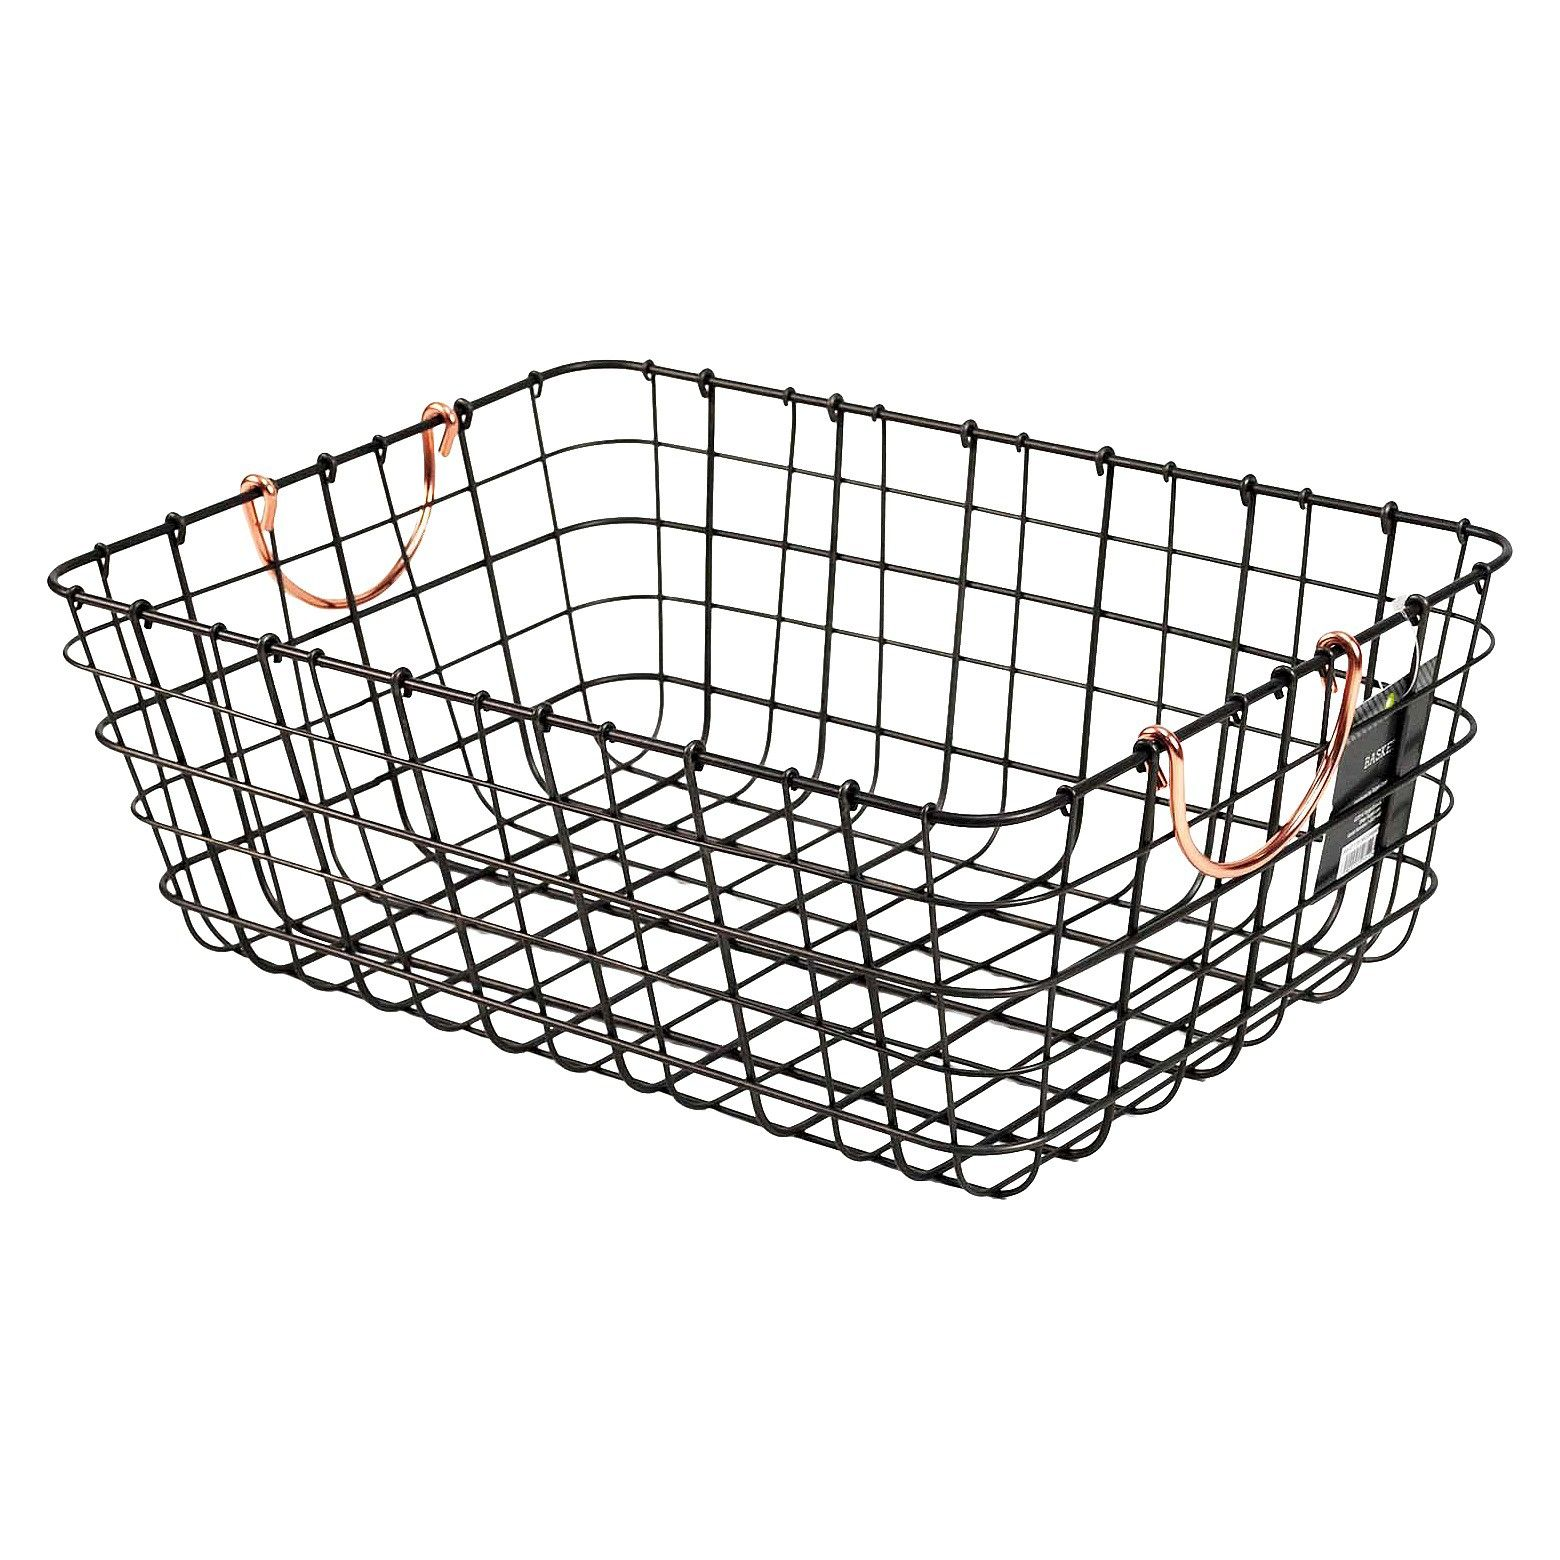 Threshold Antique Pewter Decorative Wire Basket - Black | Antique ...